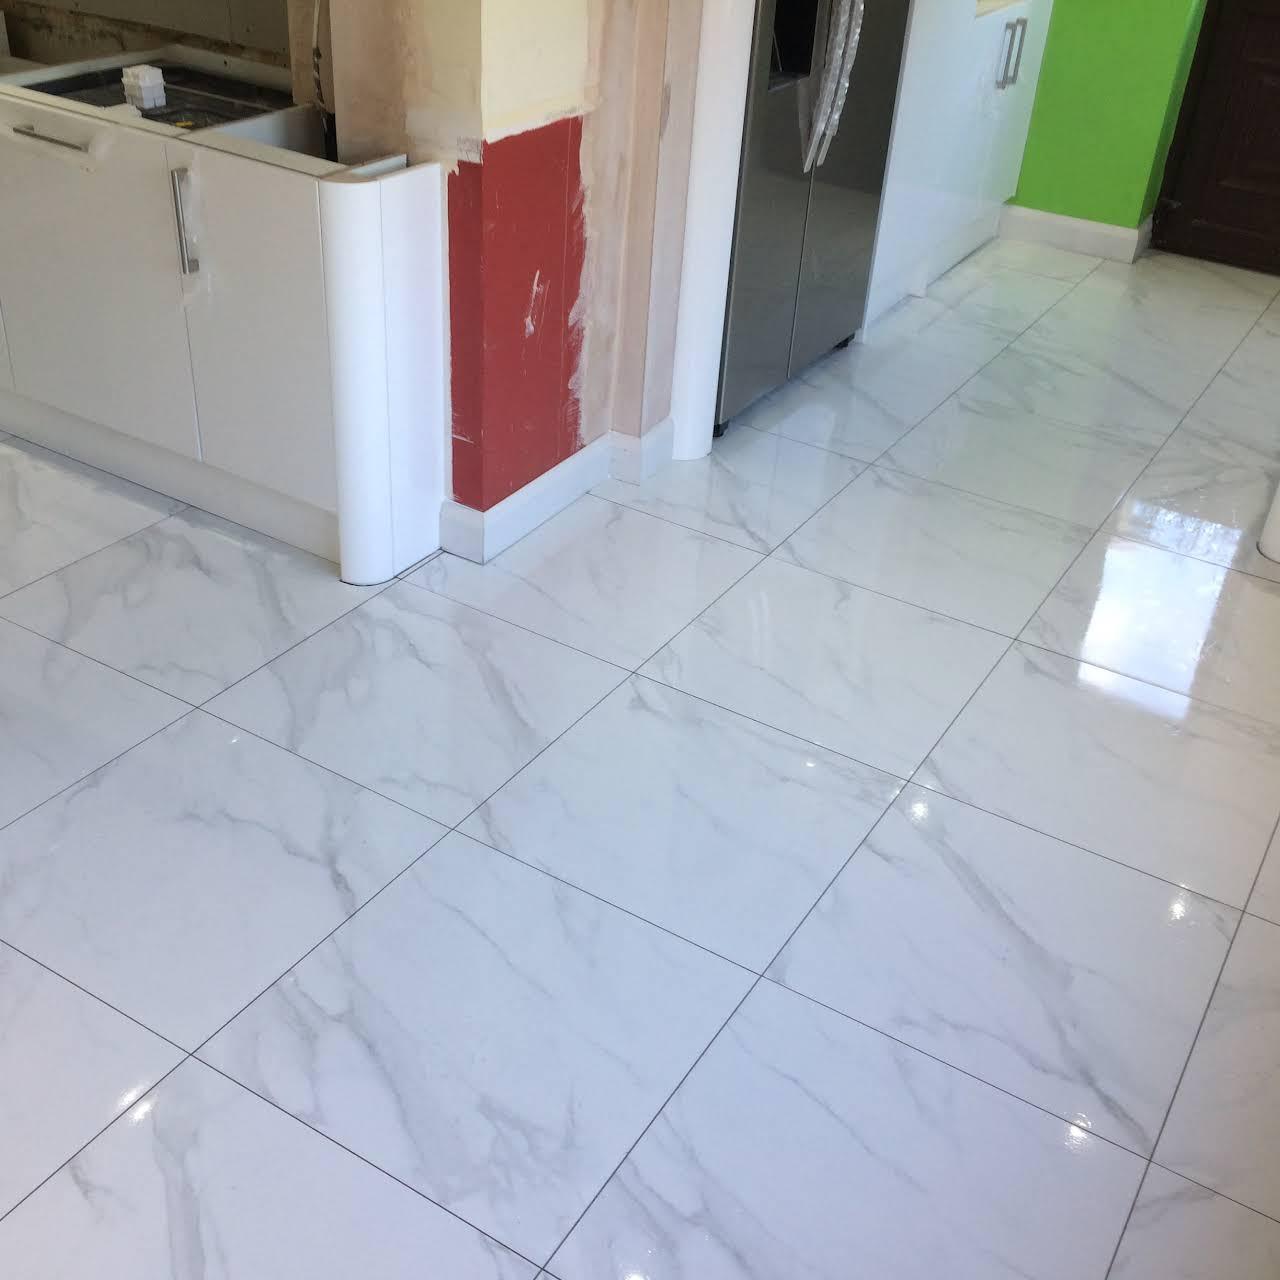 G M Ceramic Tiling - Tile Contractor